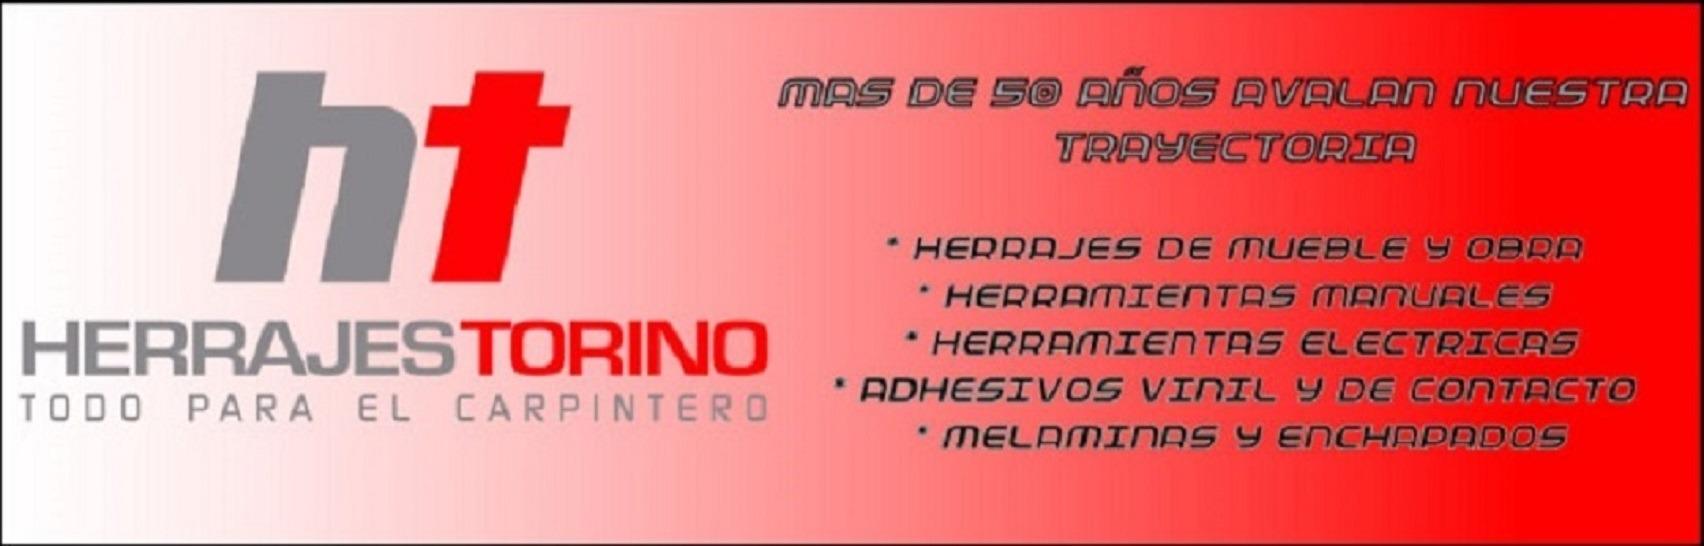 HT- HERRAJES TORINO